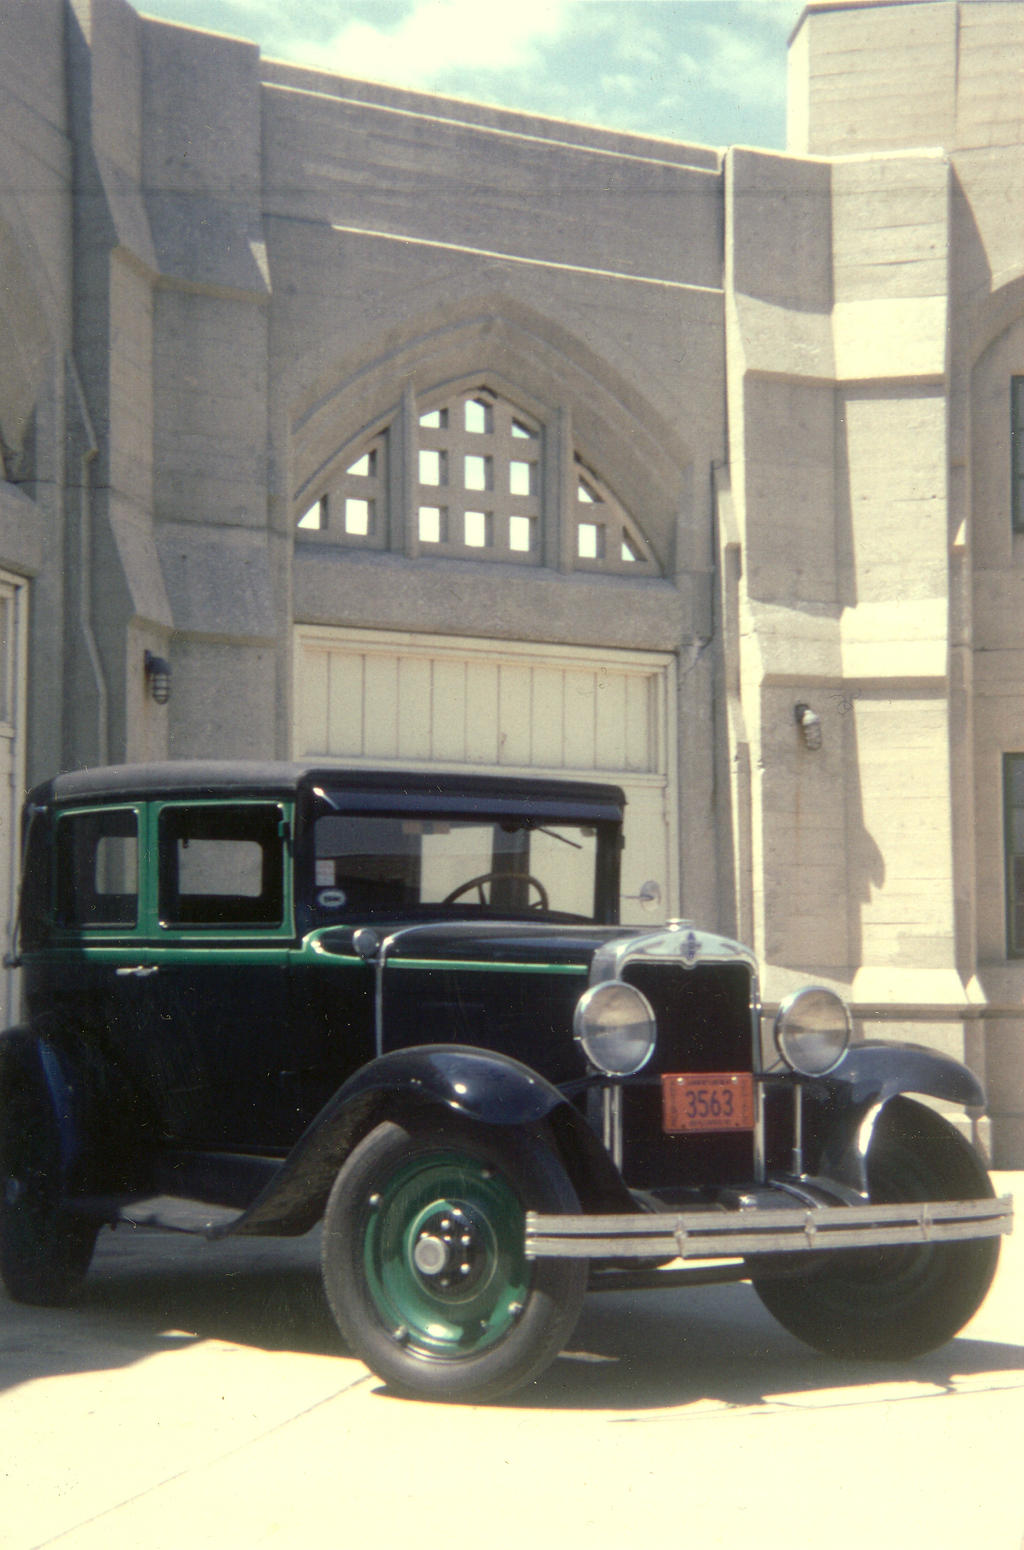 1929 Chevrolet Imperial Sedan by PRR8157